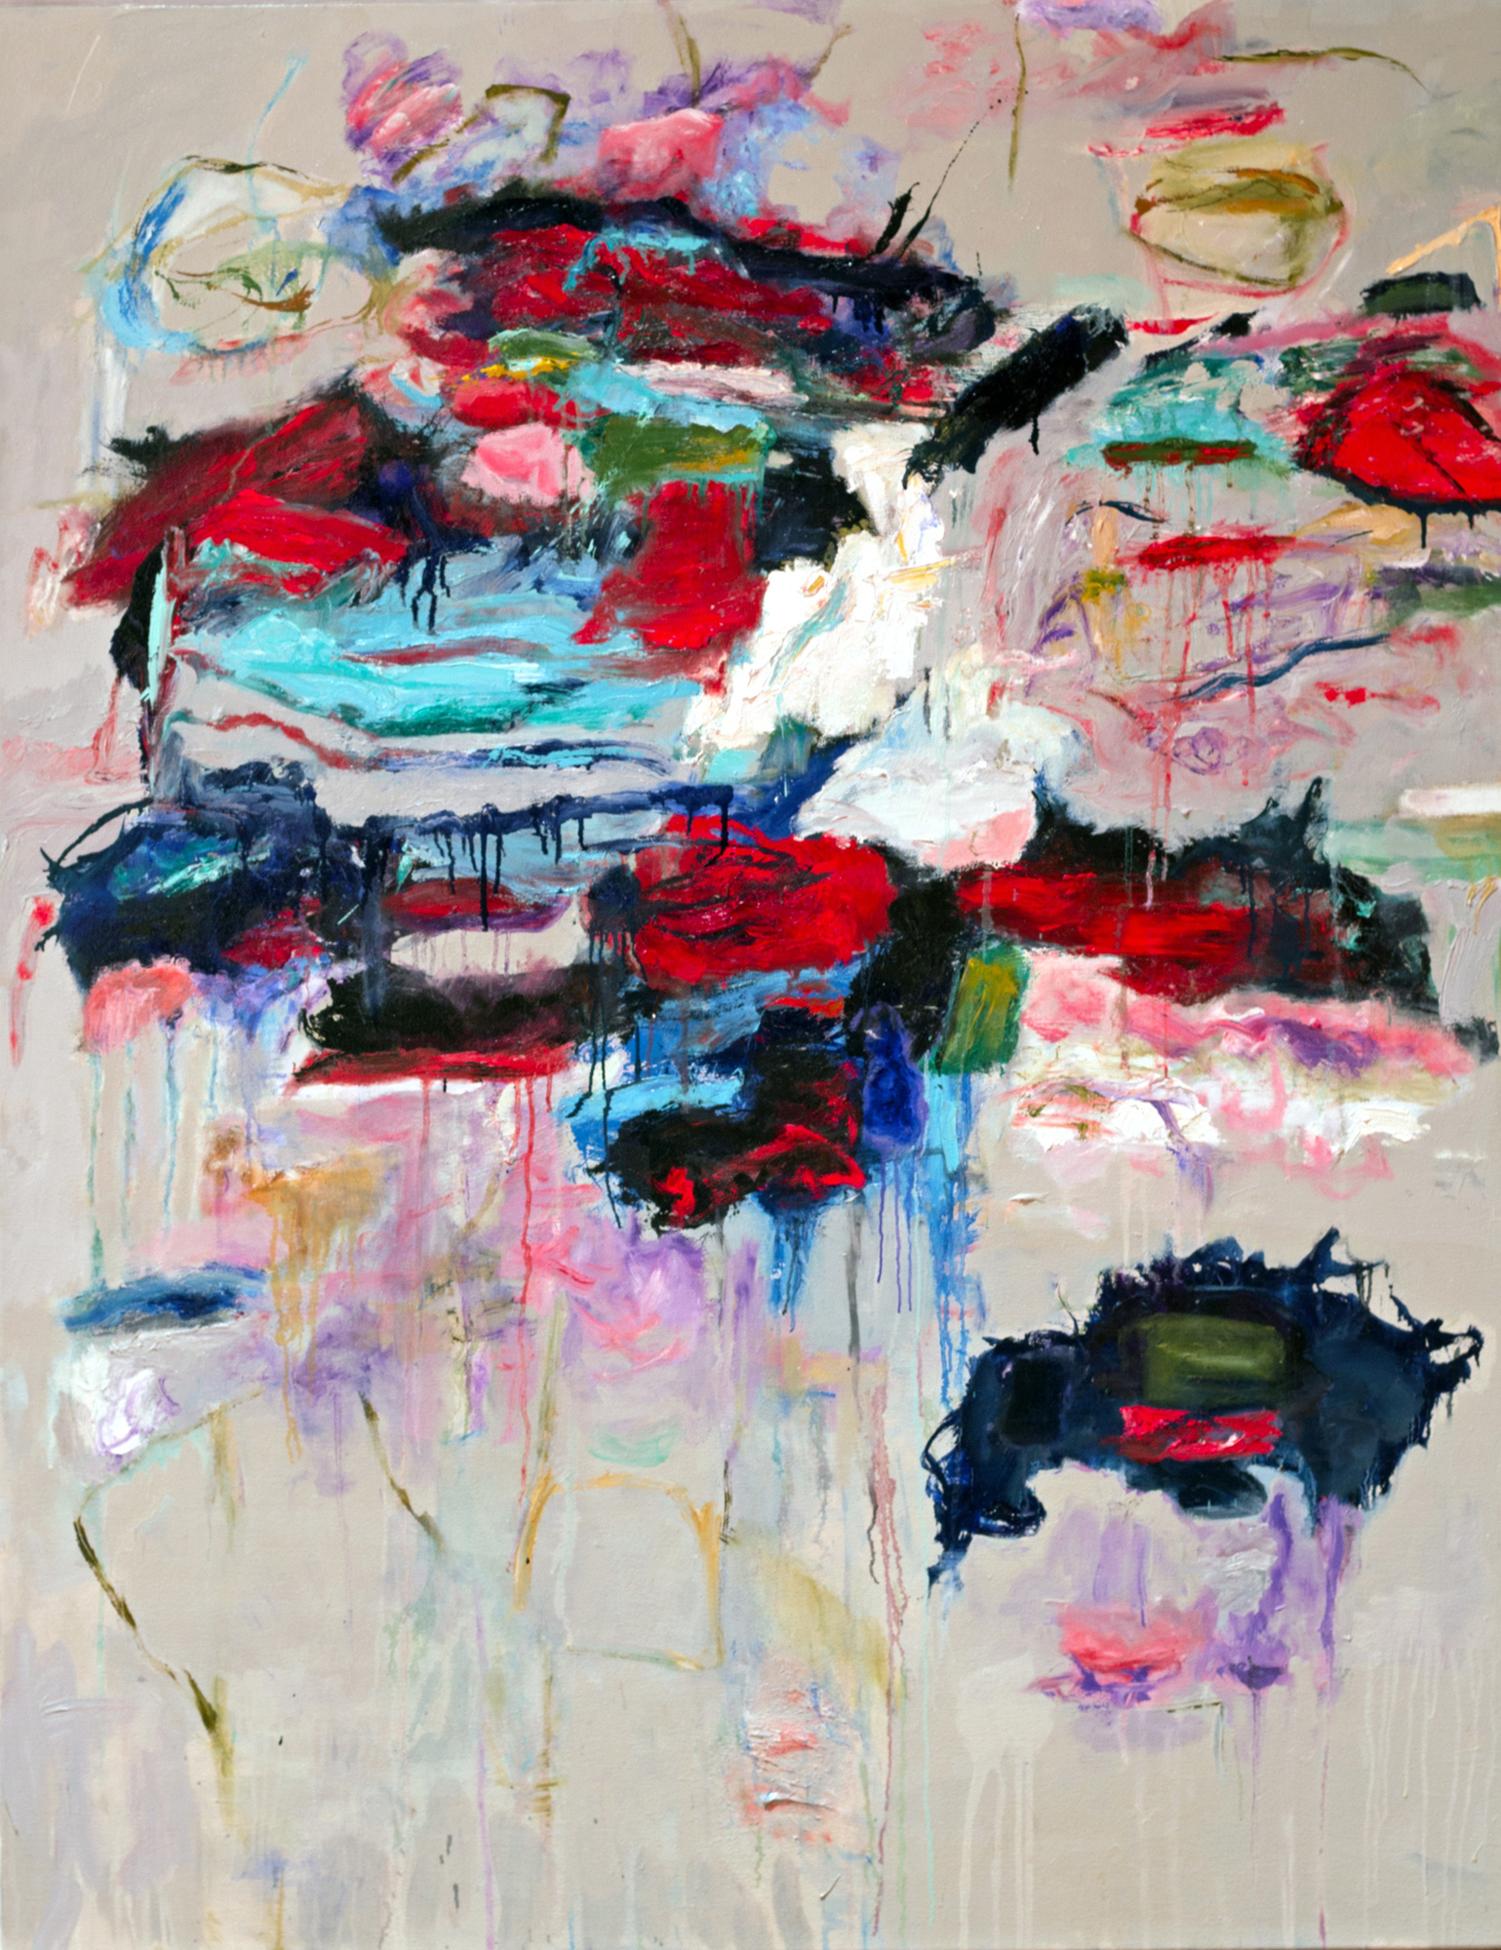 Katherine Borkowski-Byrne,  Tall Tale , Oil on canvas, 60x48